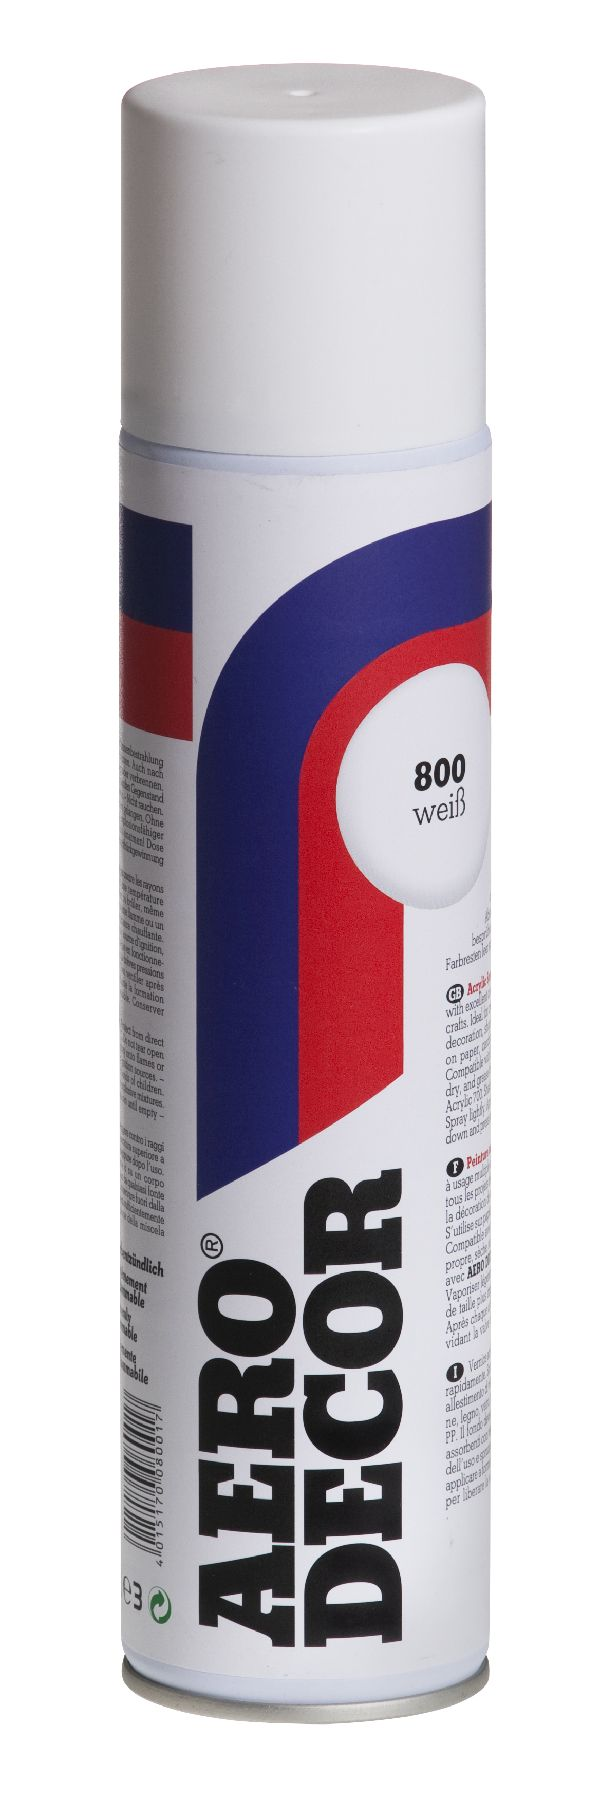 Colorspray, Farbspray WEISS 800 400 ml